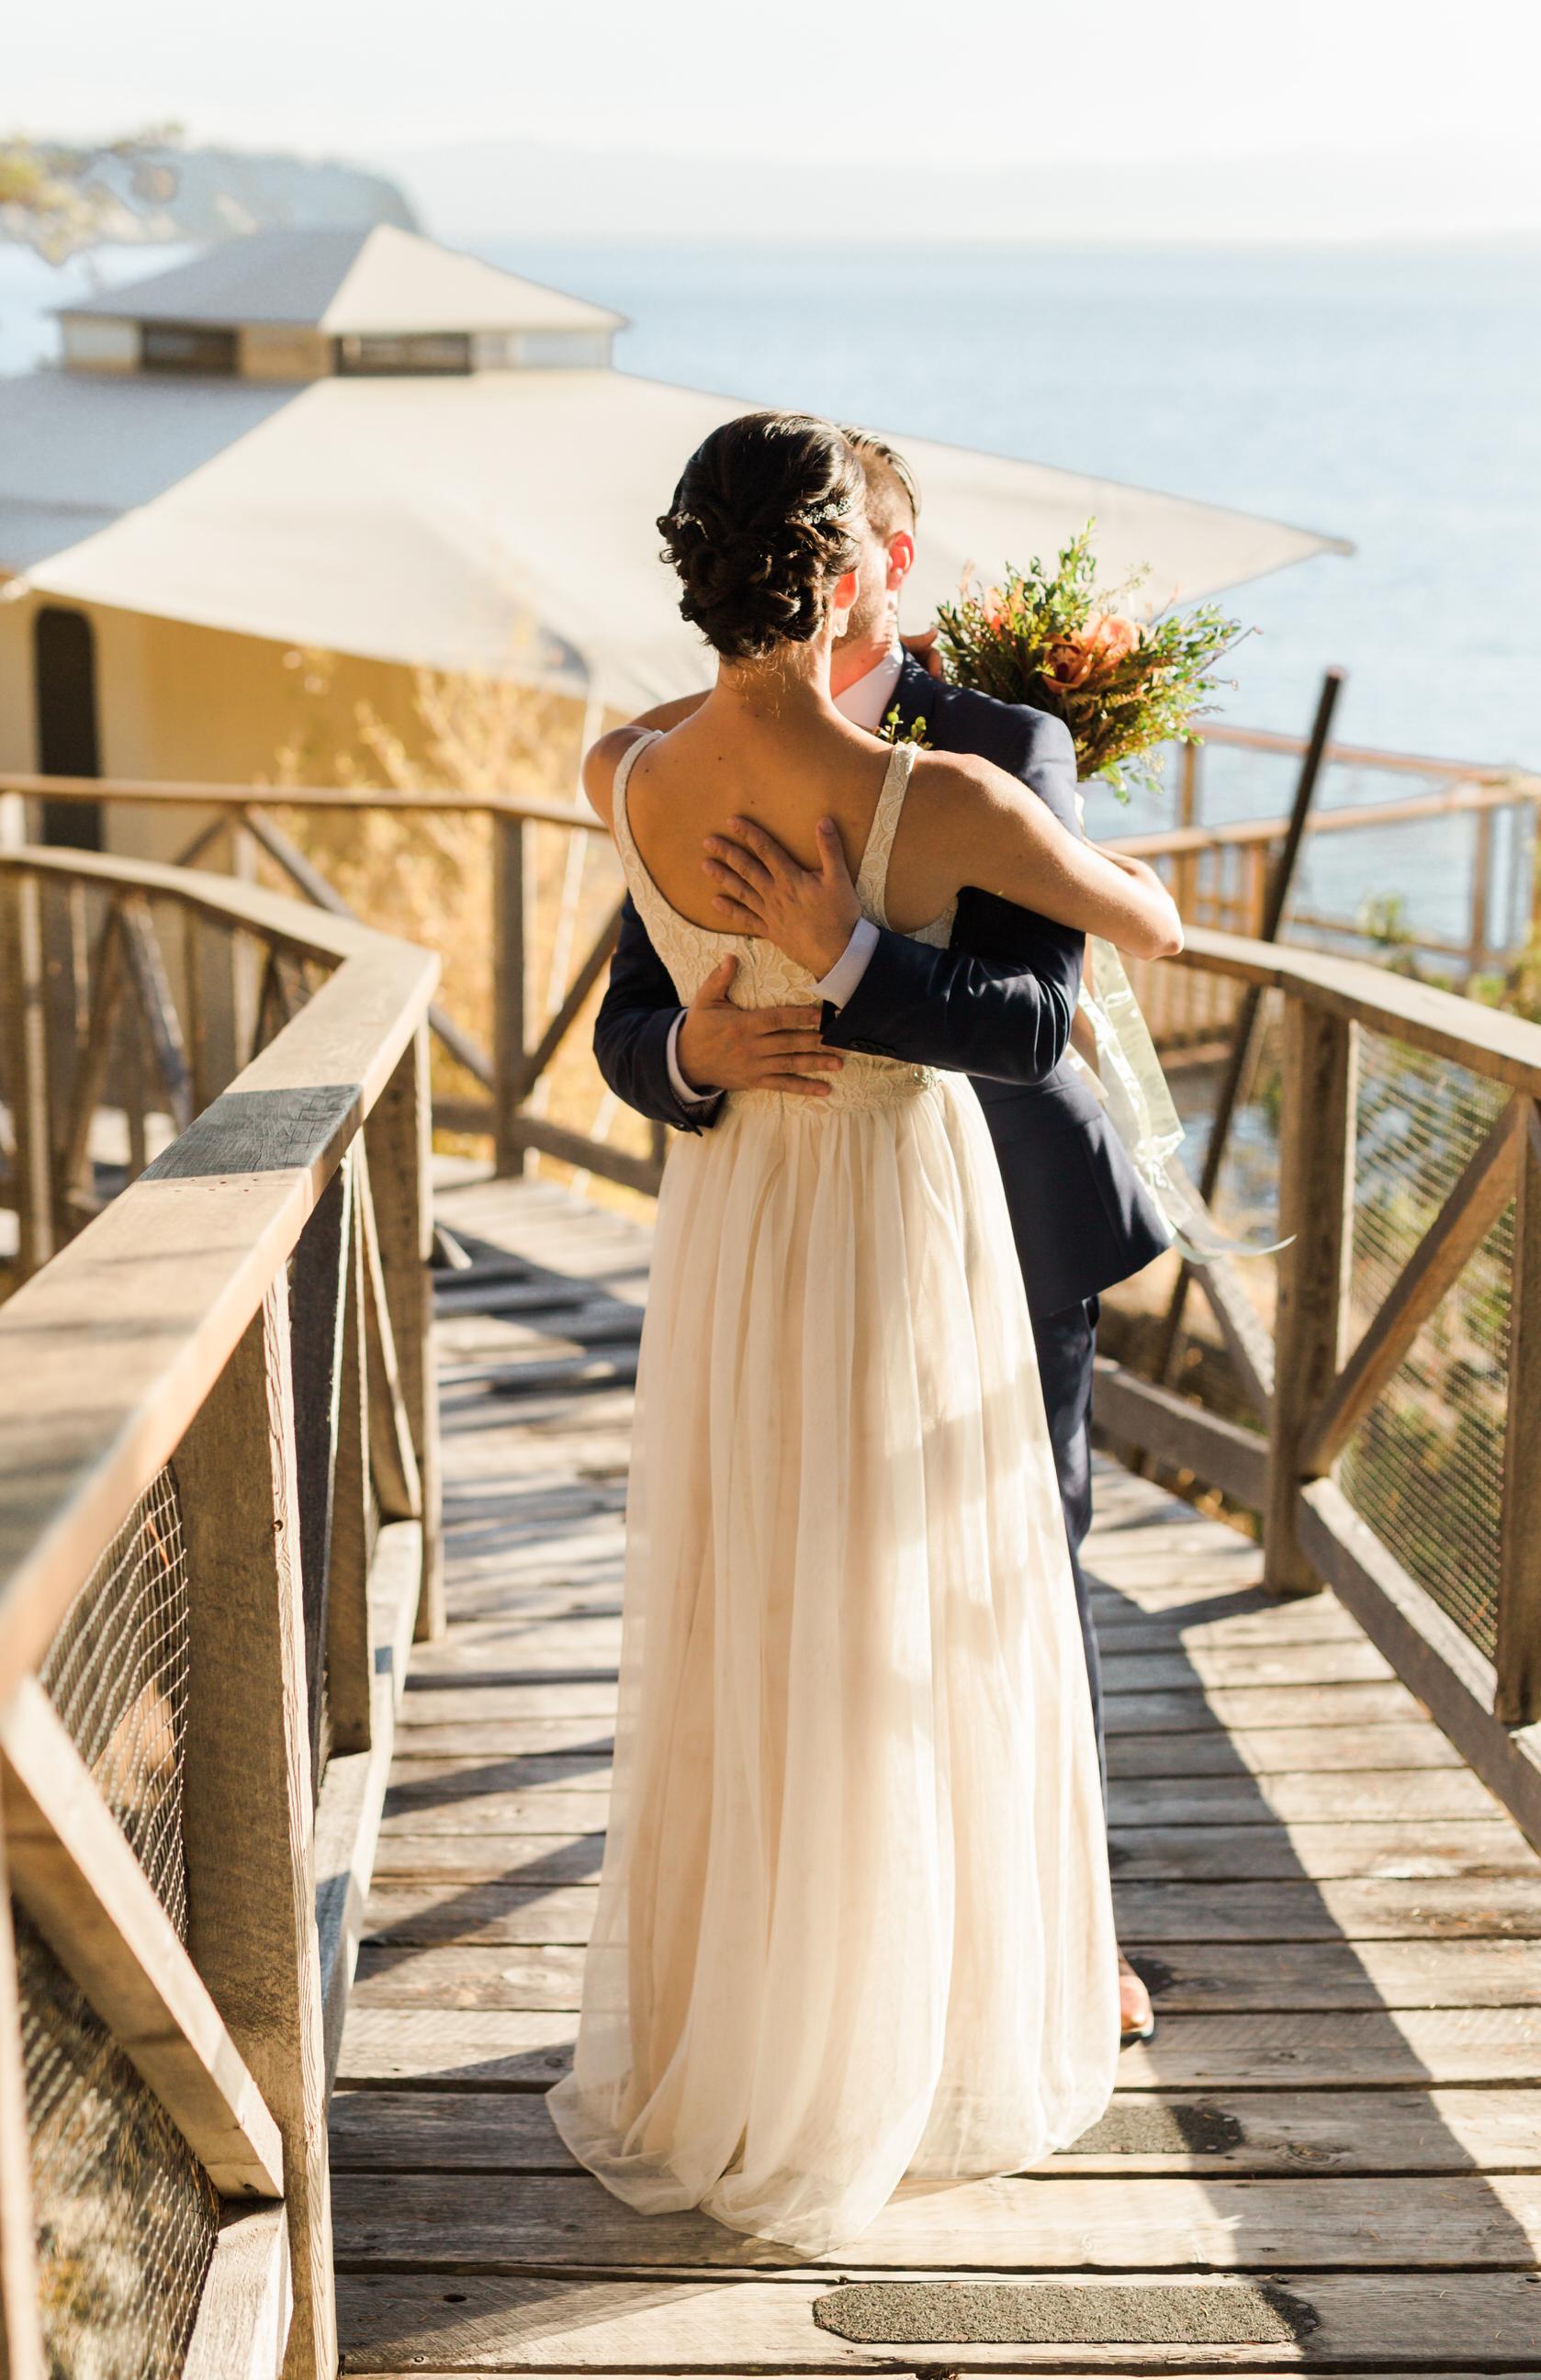 Rockwater Secret Cove Resort Wedding - Sunshine Coast BC Wedding Photographer - Vancouver Wedding Photographer - Sunshine Coast Elopement Photos - IMG_0271.jpg